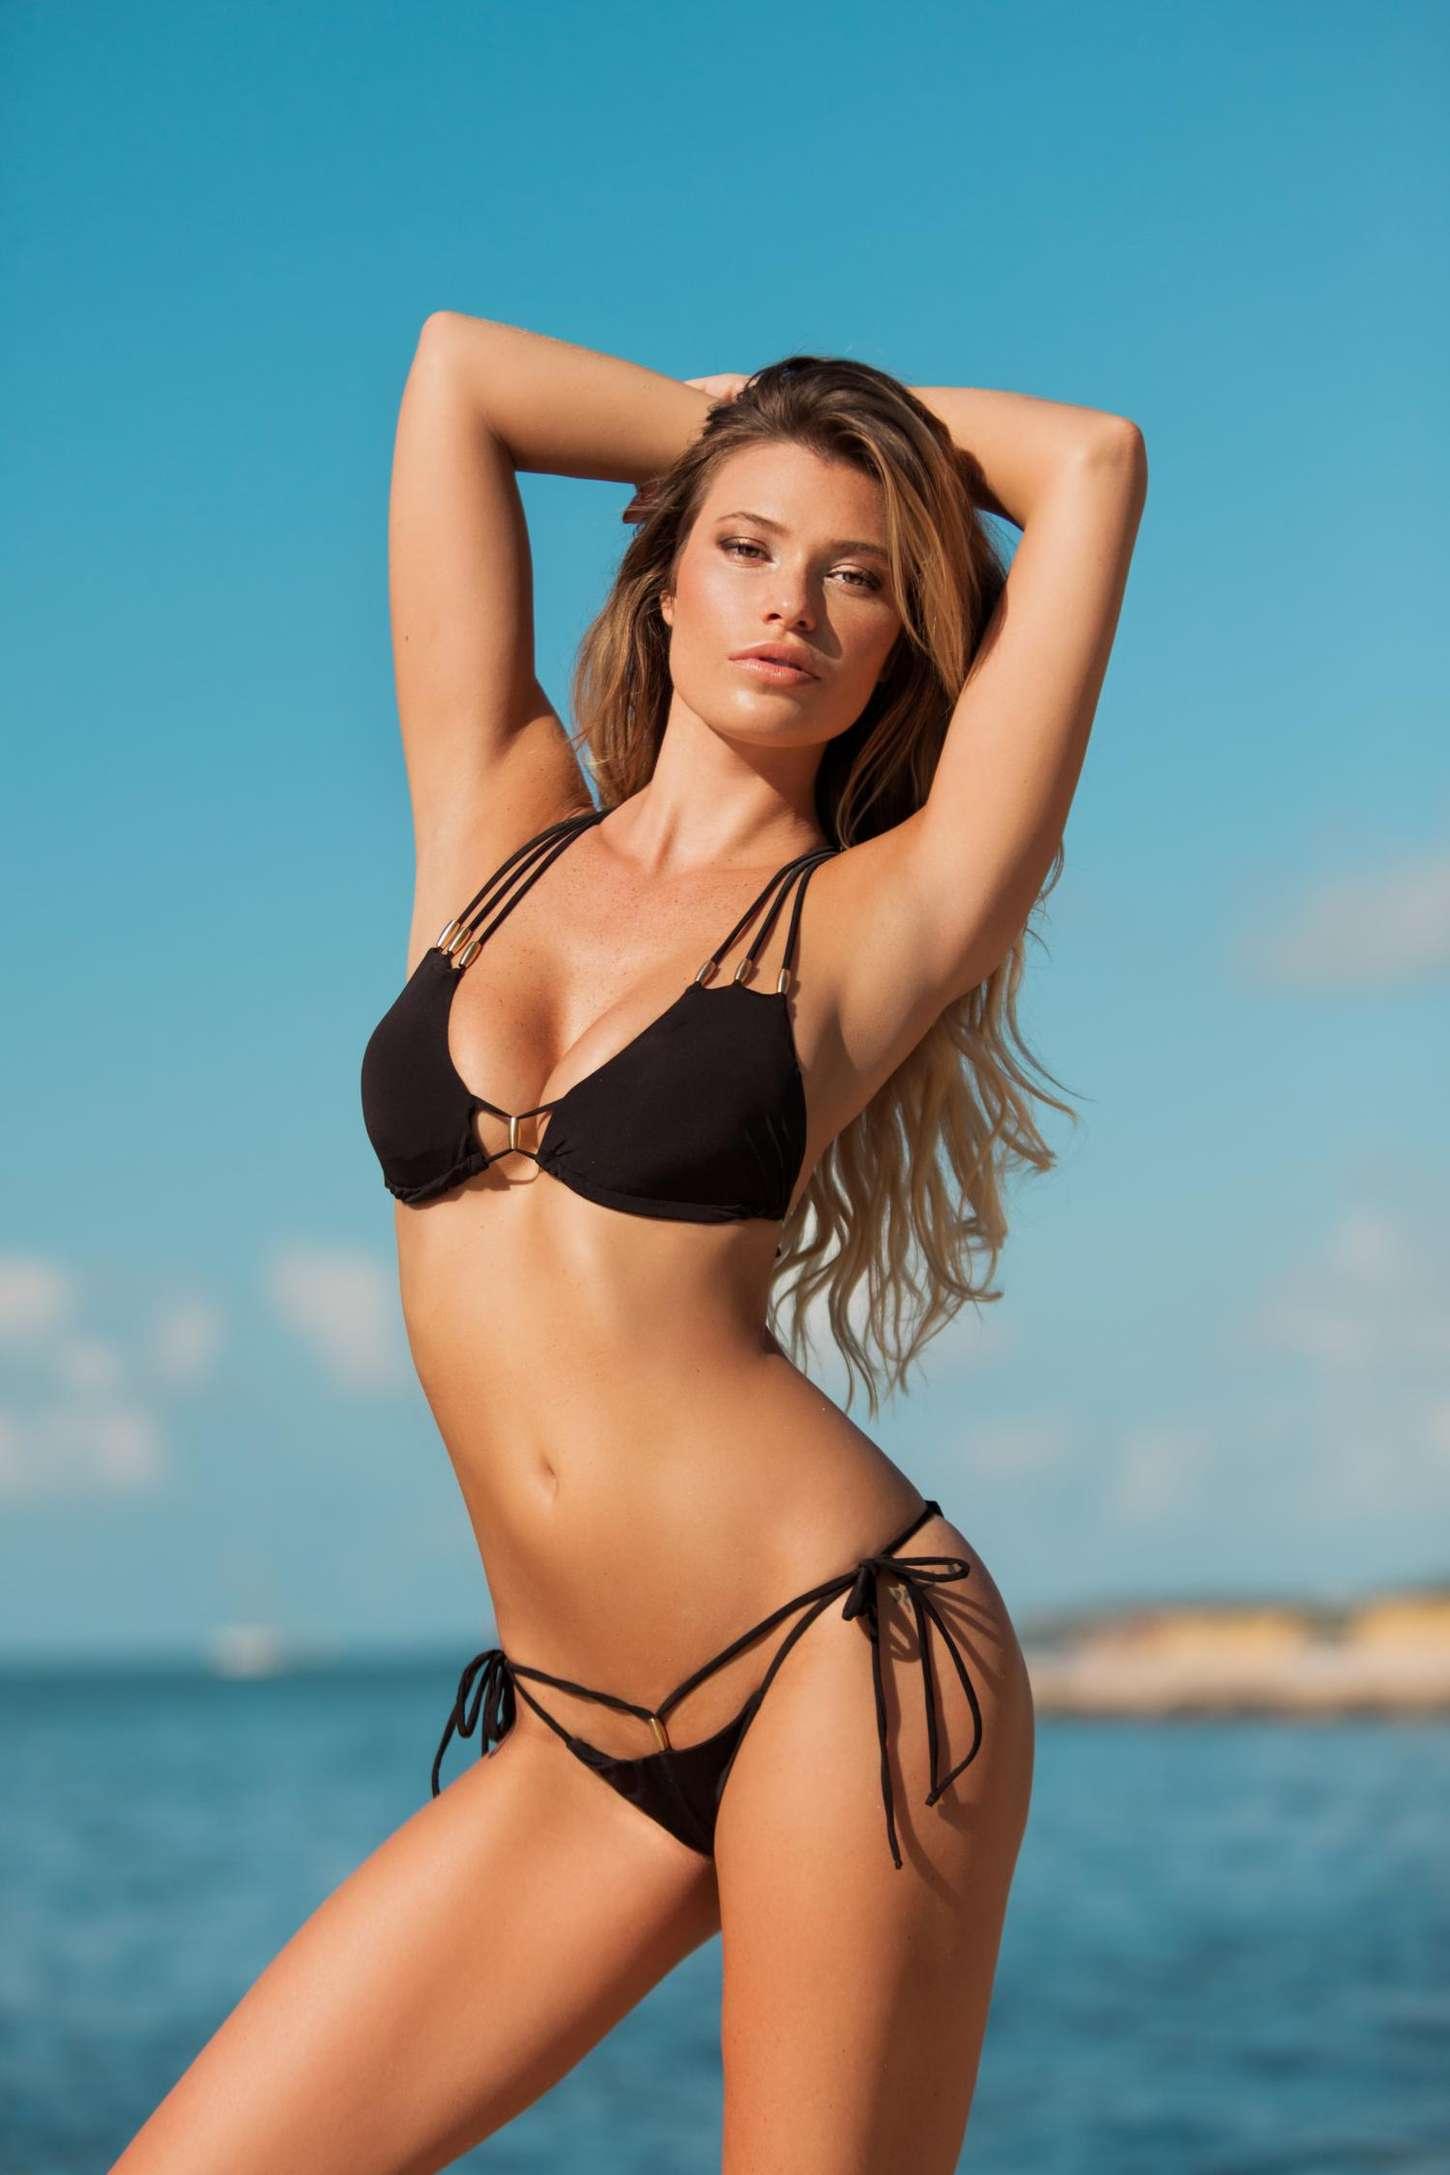 Bikini Samantha Hoopes nudes (87 photo), Sexy, Sideboobs, Twitter, underwear 2006